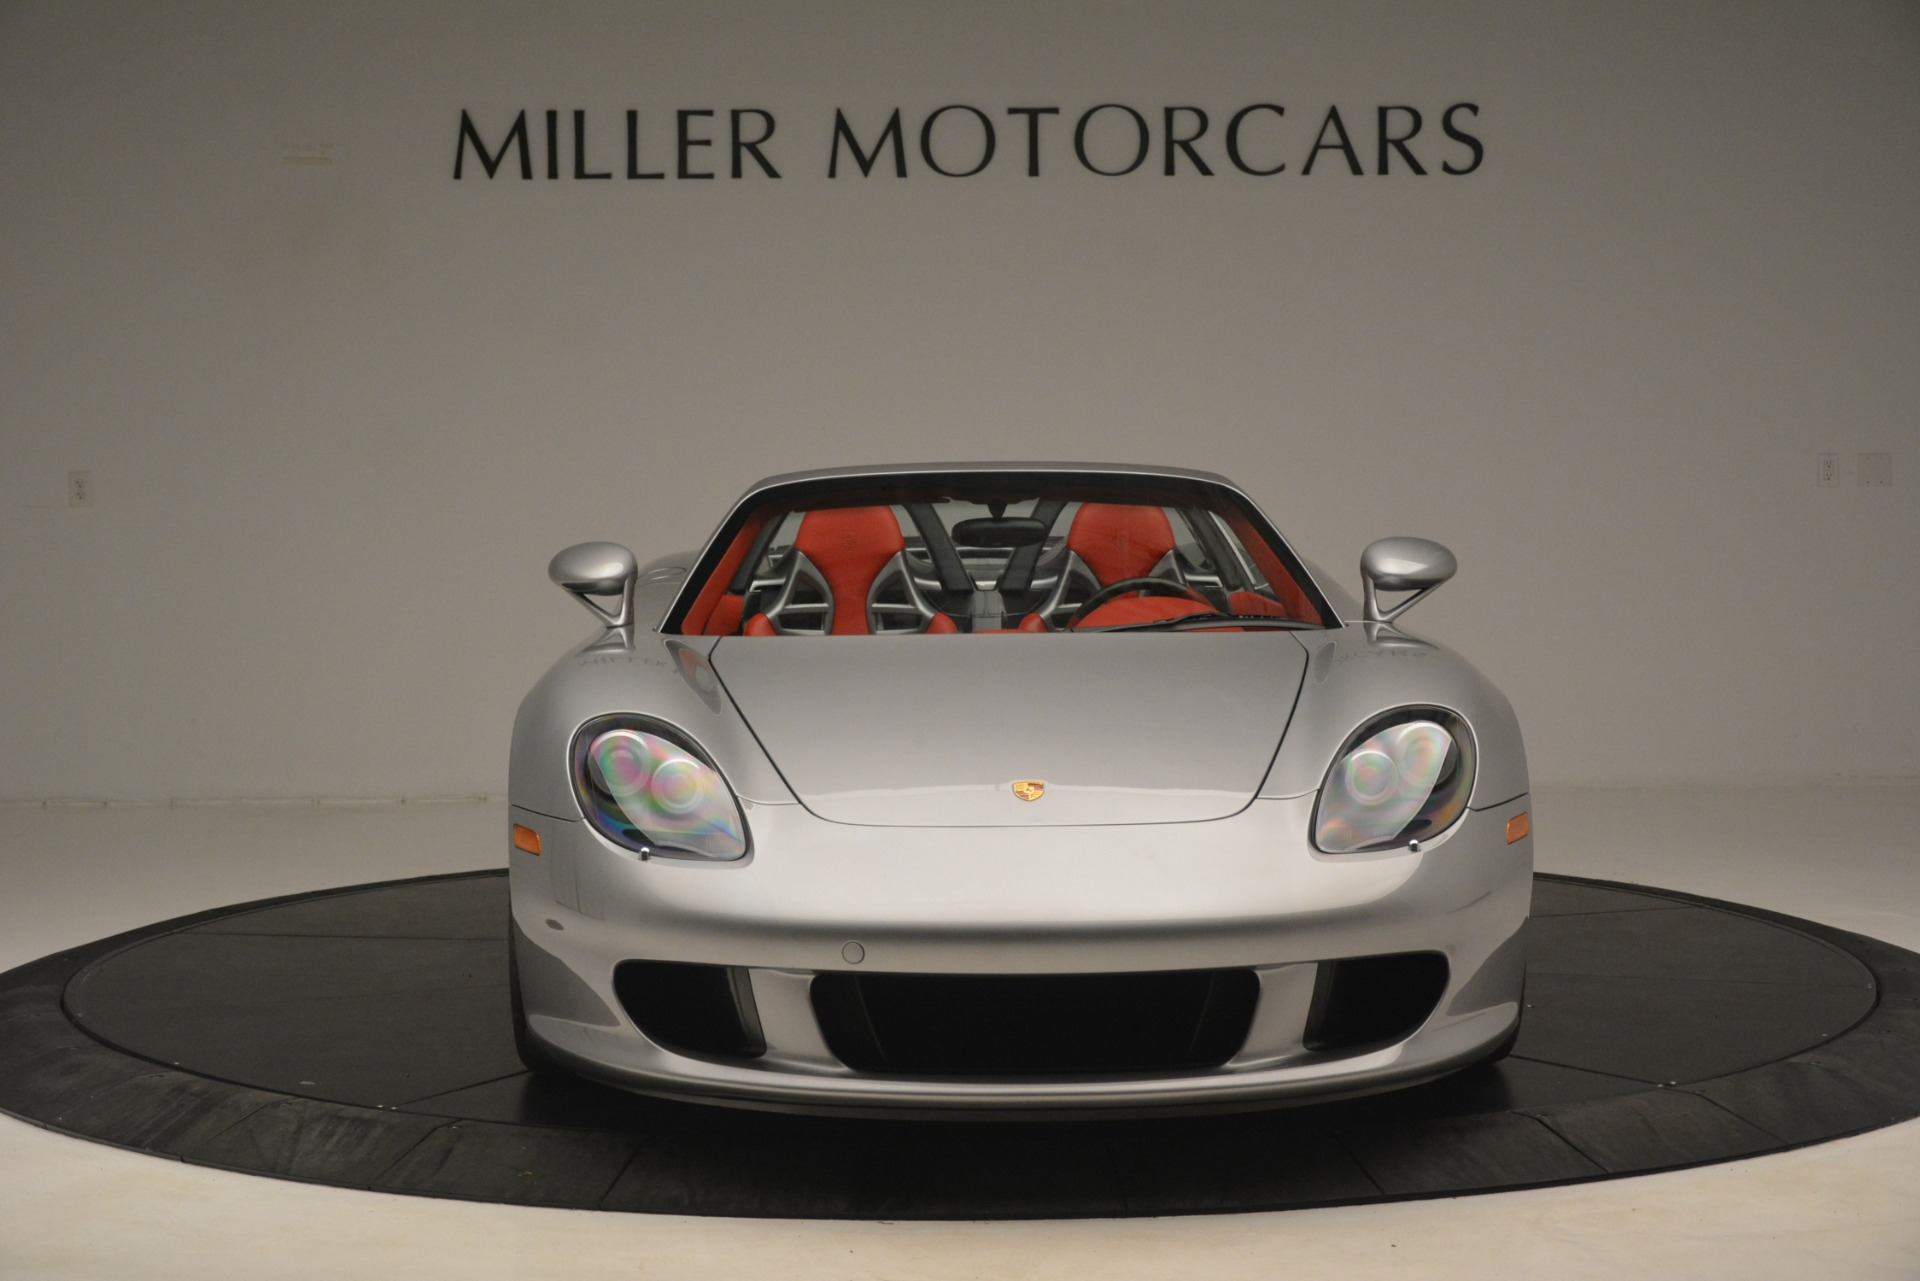 Used 2005 Porsche Carrera GT  For Sale In Greenwich, CT 3161_p22